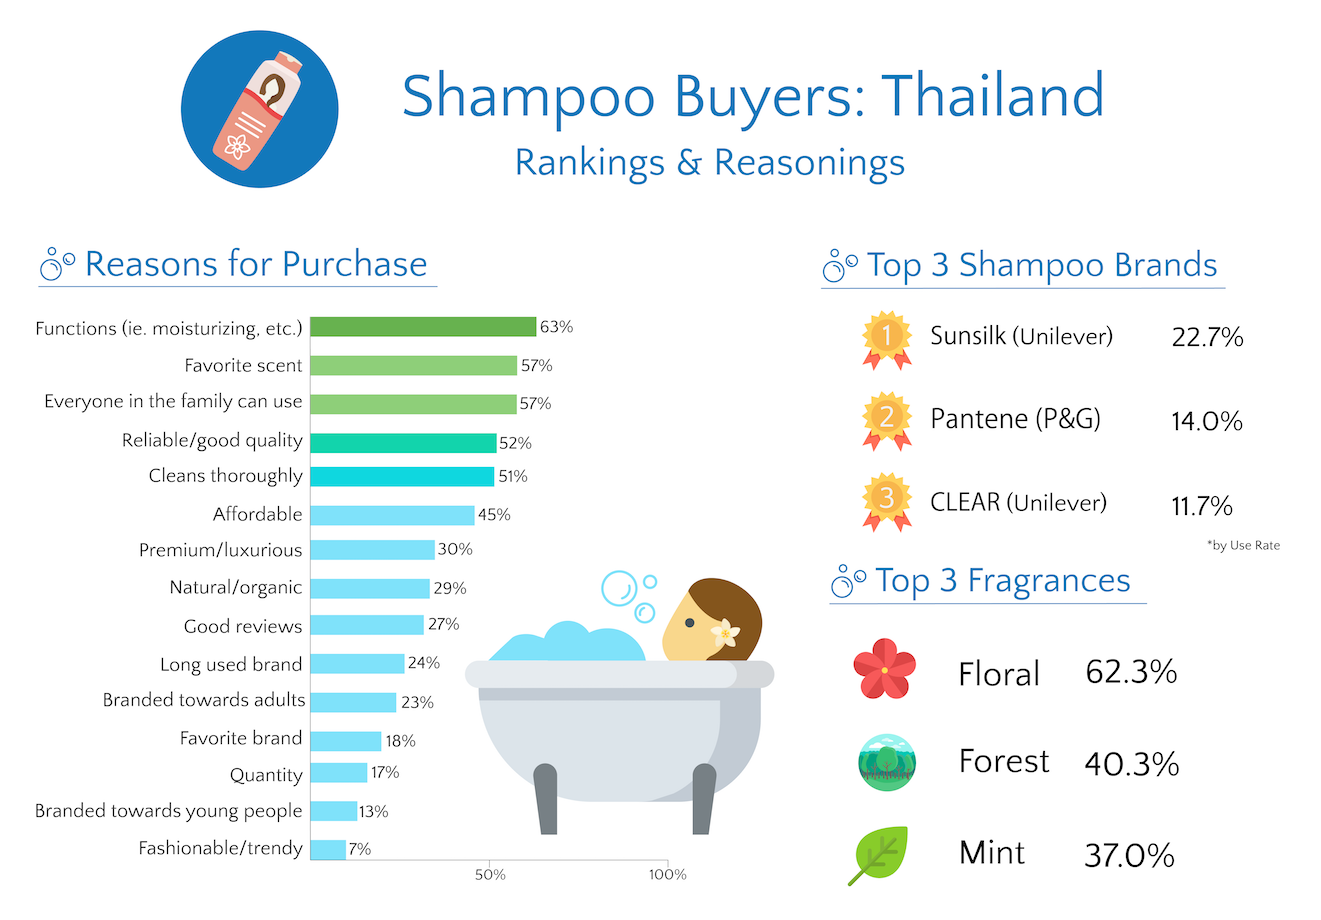 thailand shampoo buyer ranking and reasoning